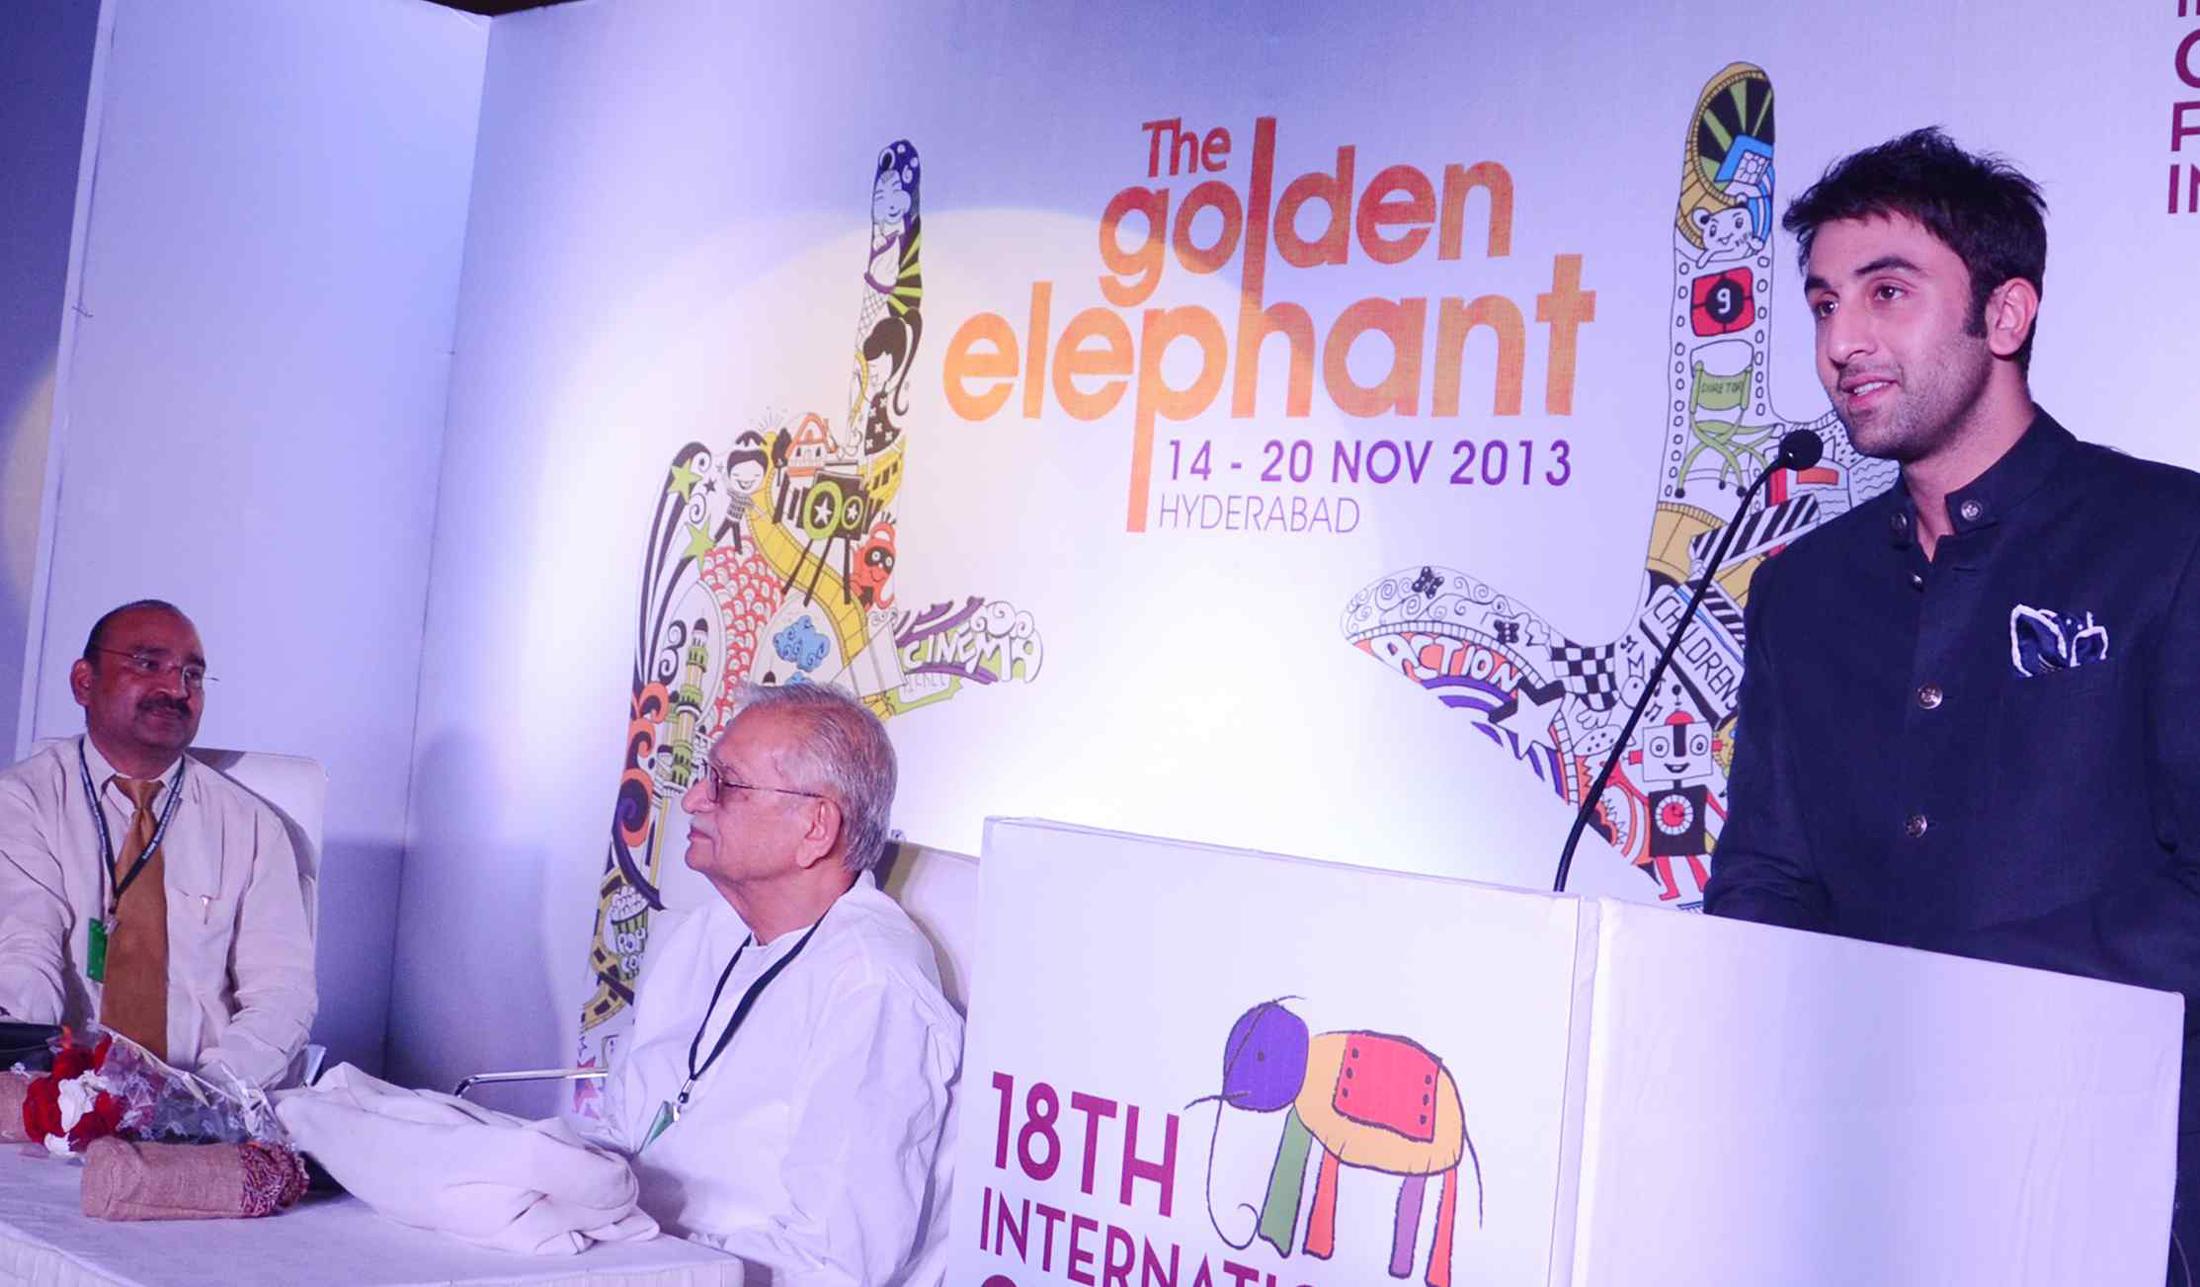 File:Bollywood actor Shri Ranbir Kapoor speaking to media